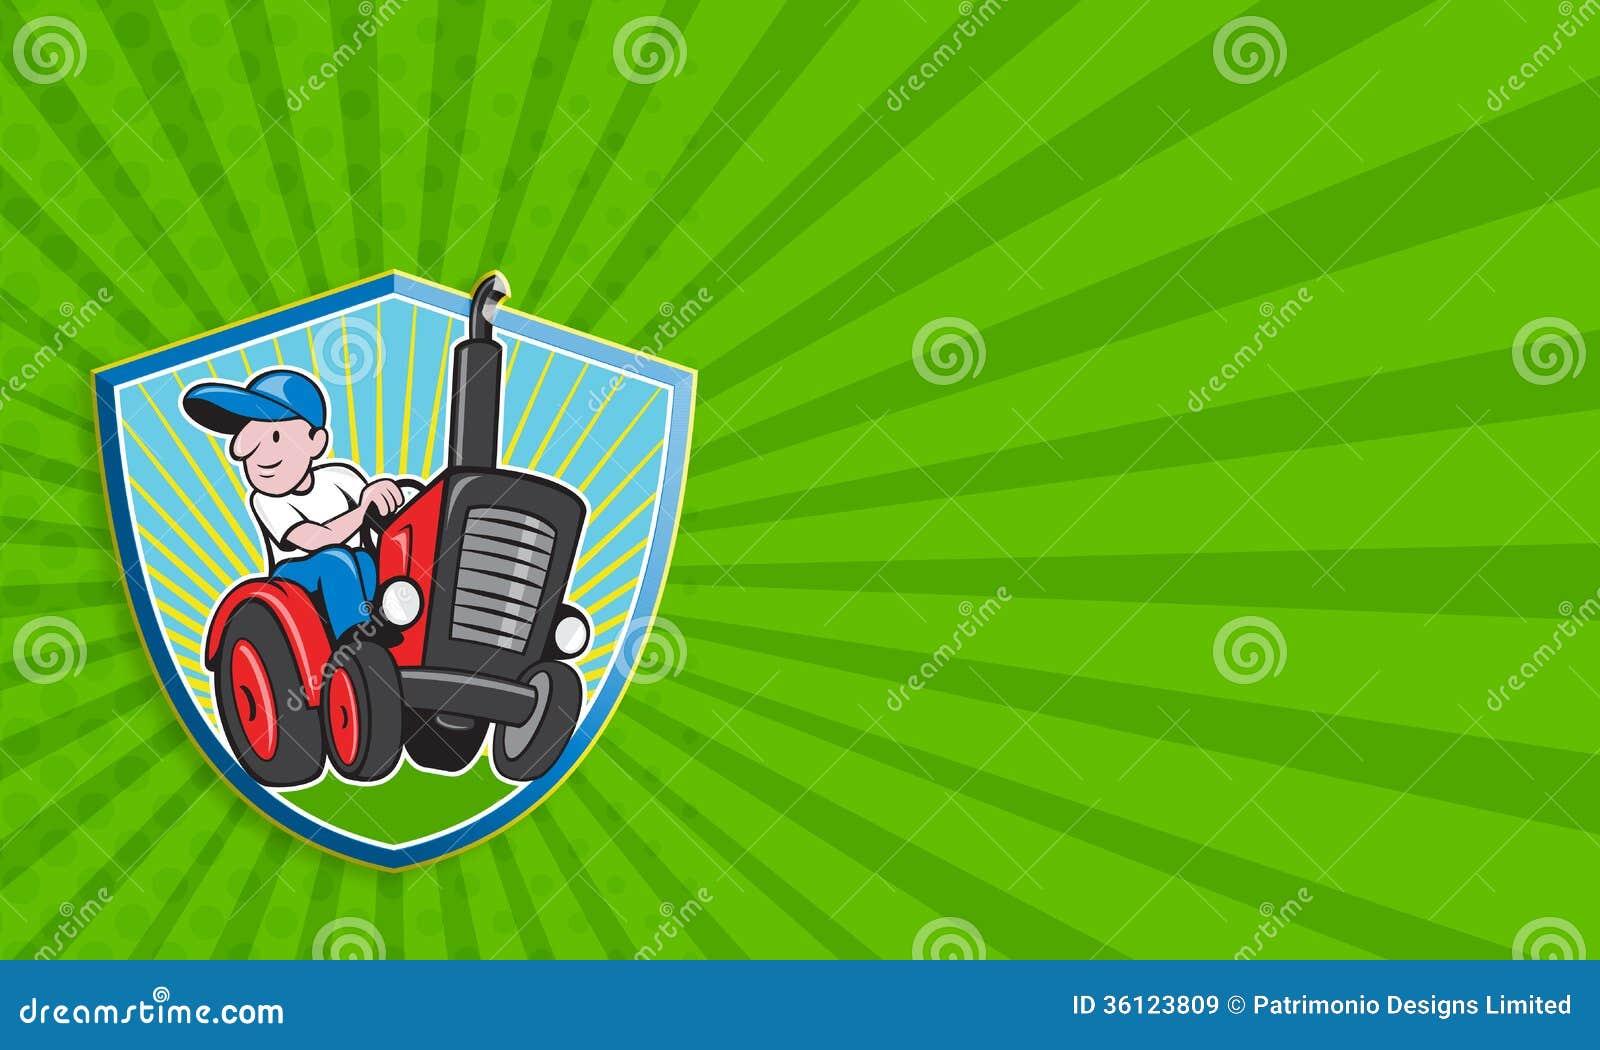 Vintage Tractor Cartoon : Farmer driving vintage tractor cartoon royalty free stock